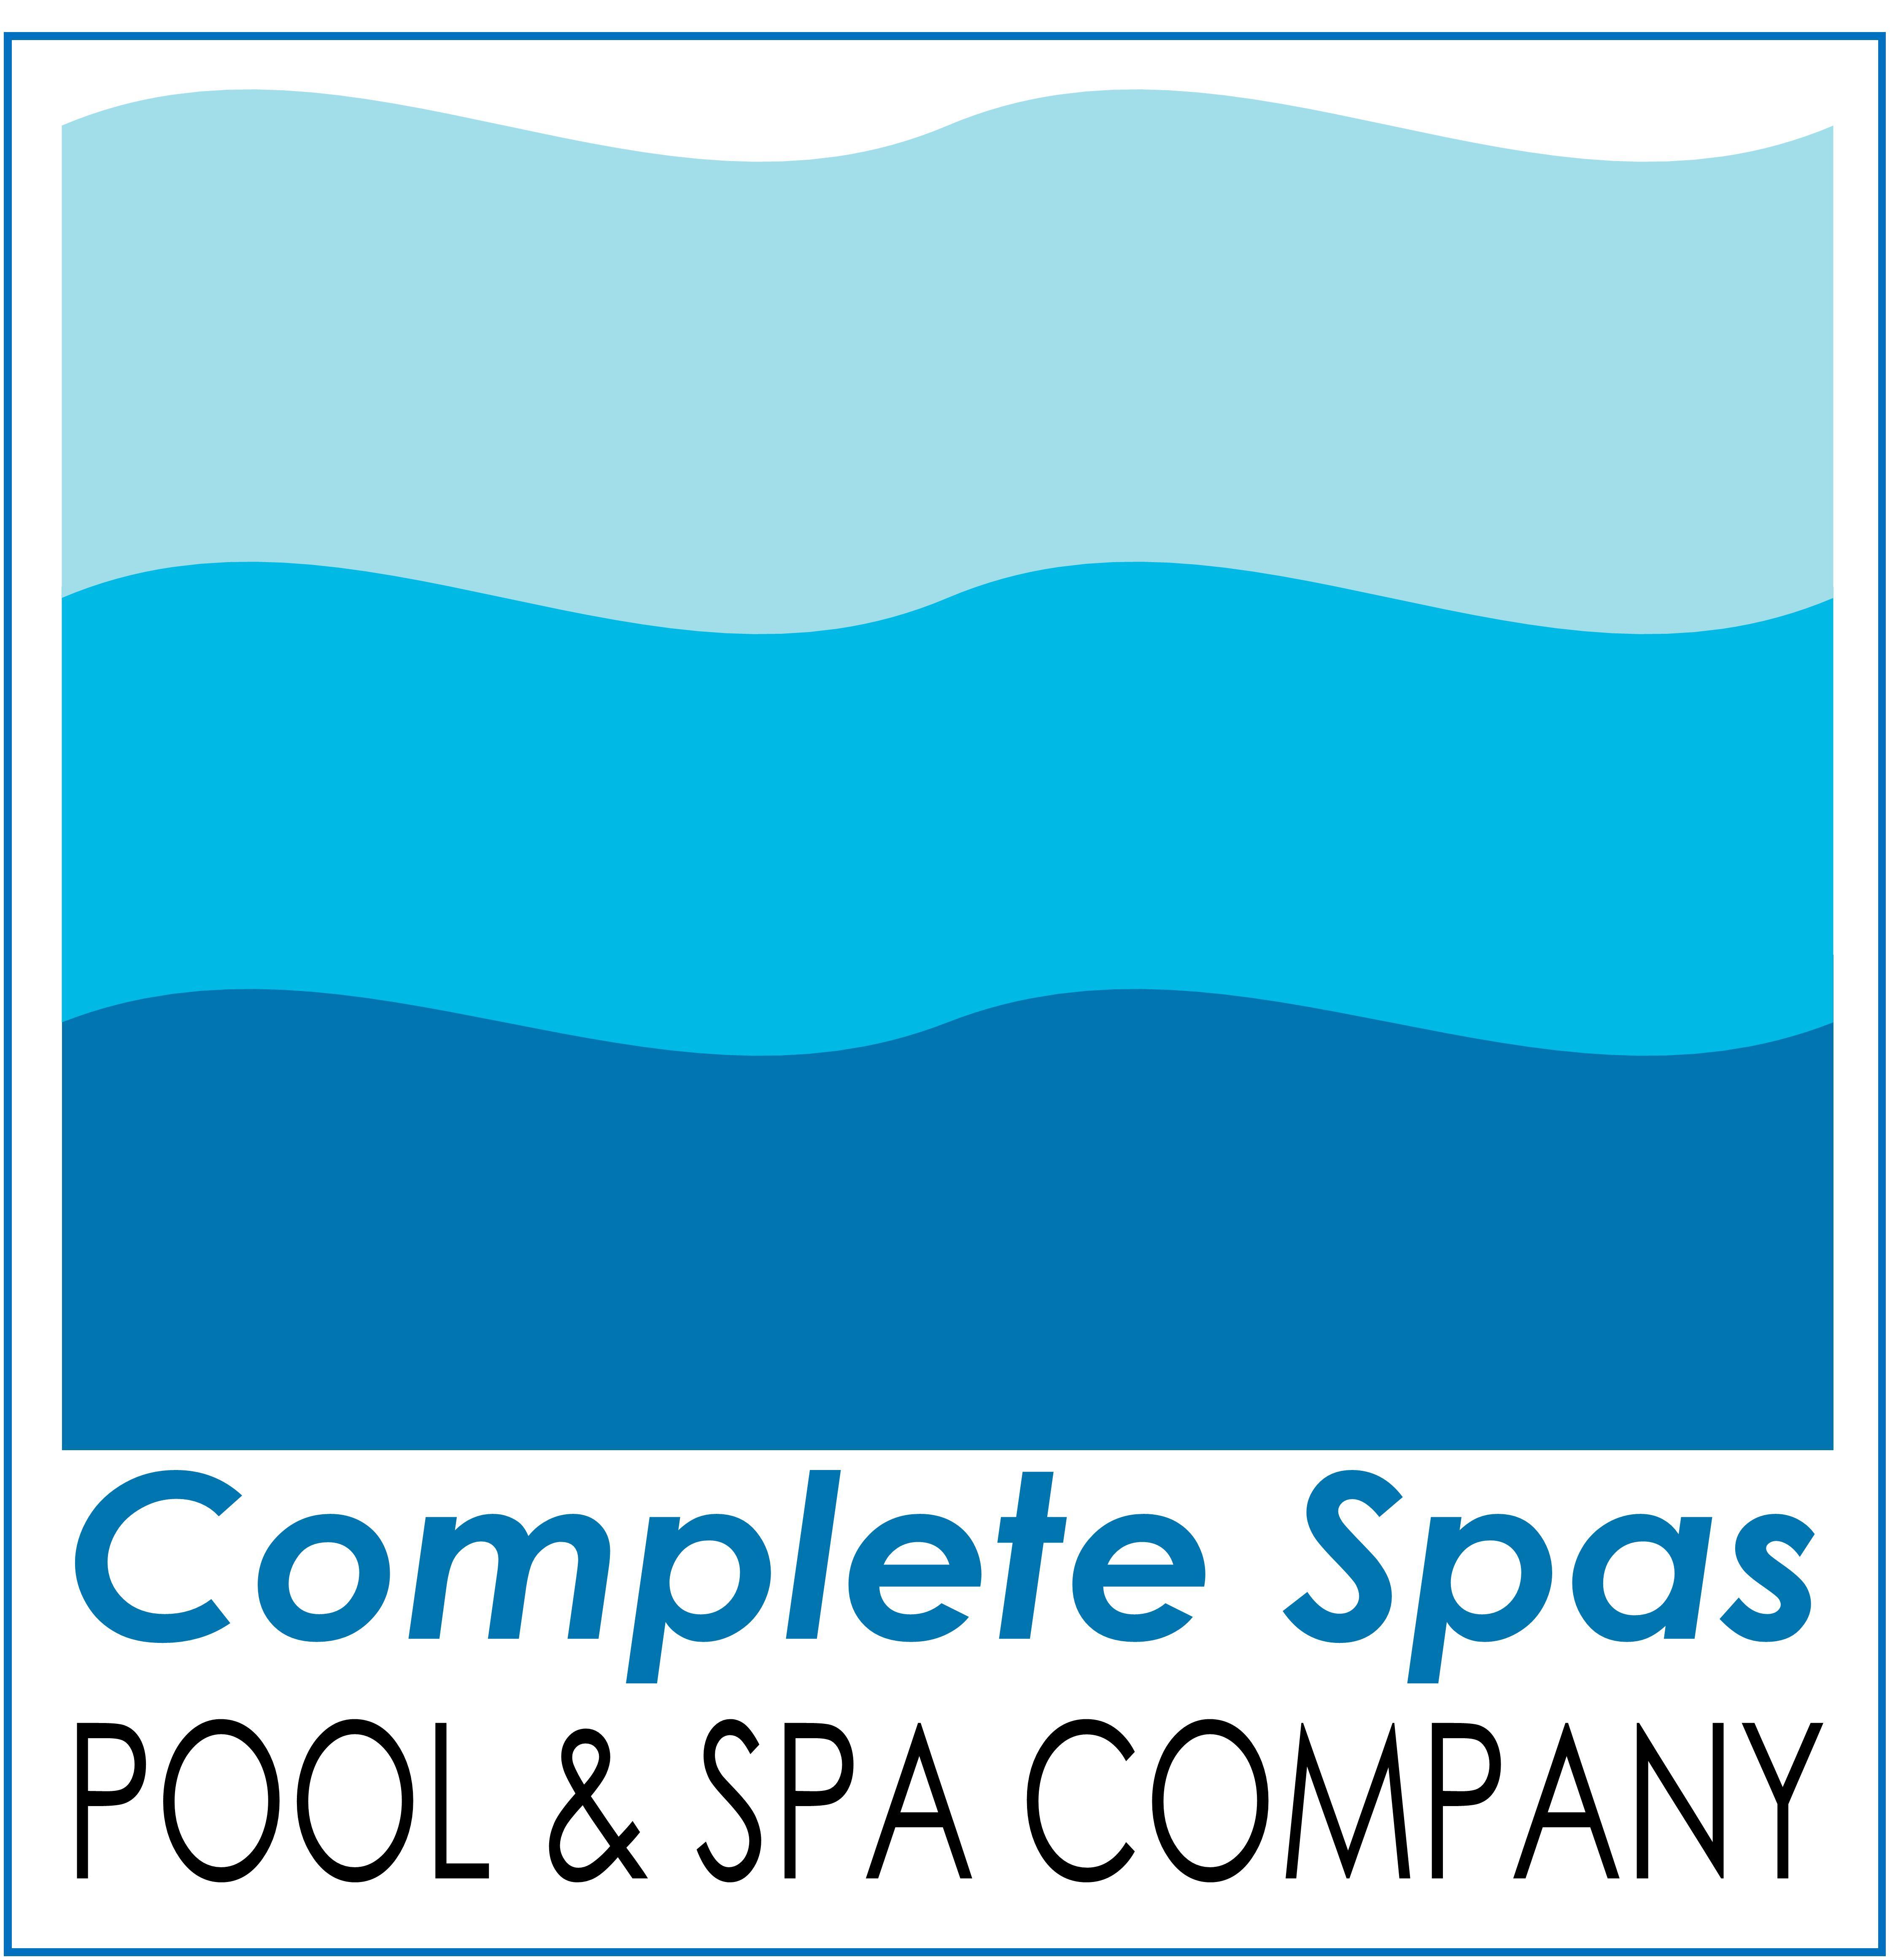 Complete Spas